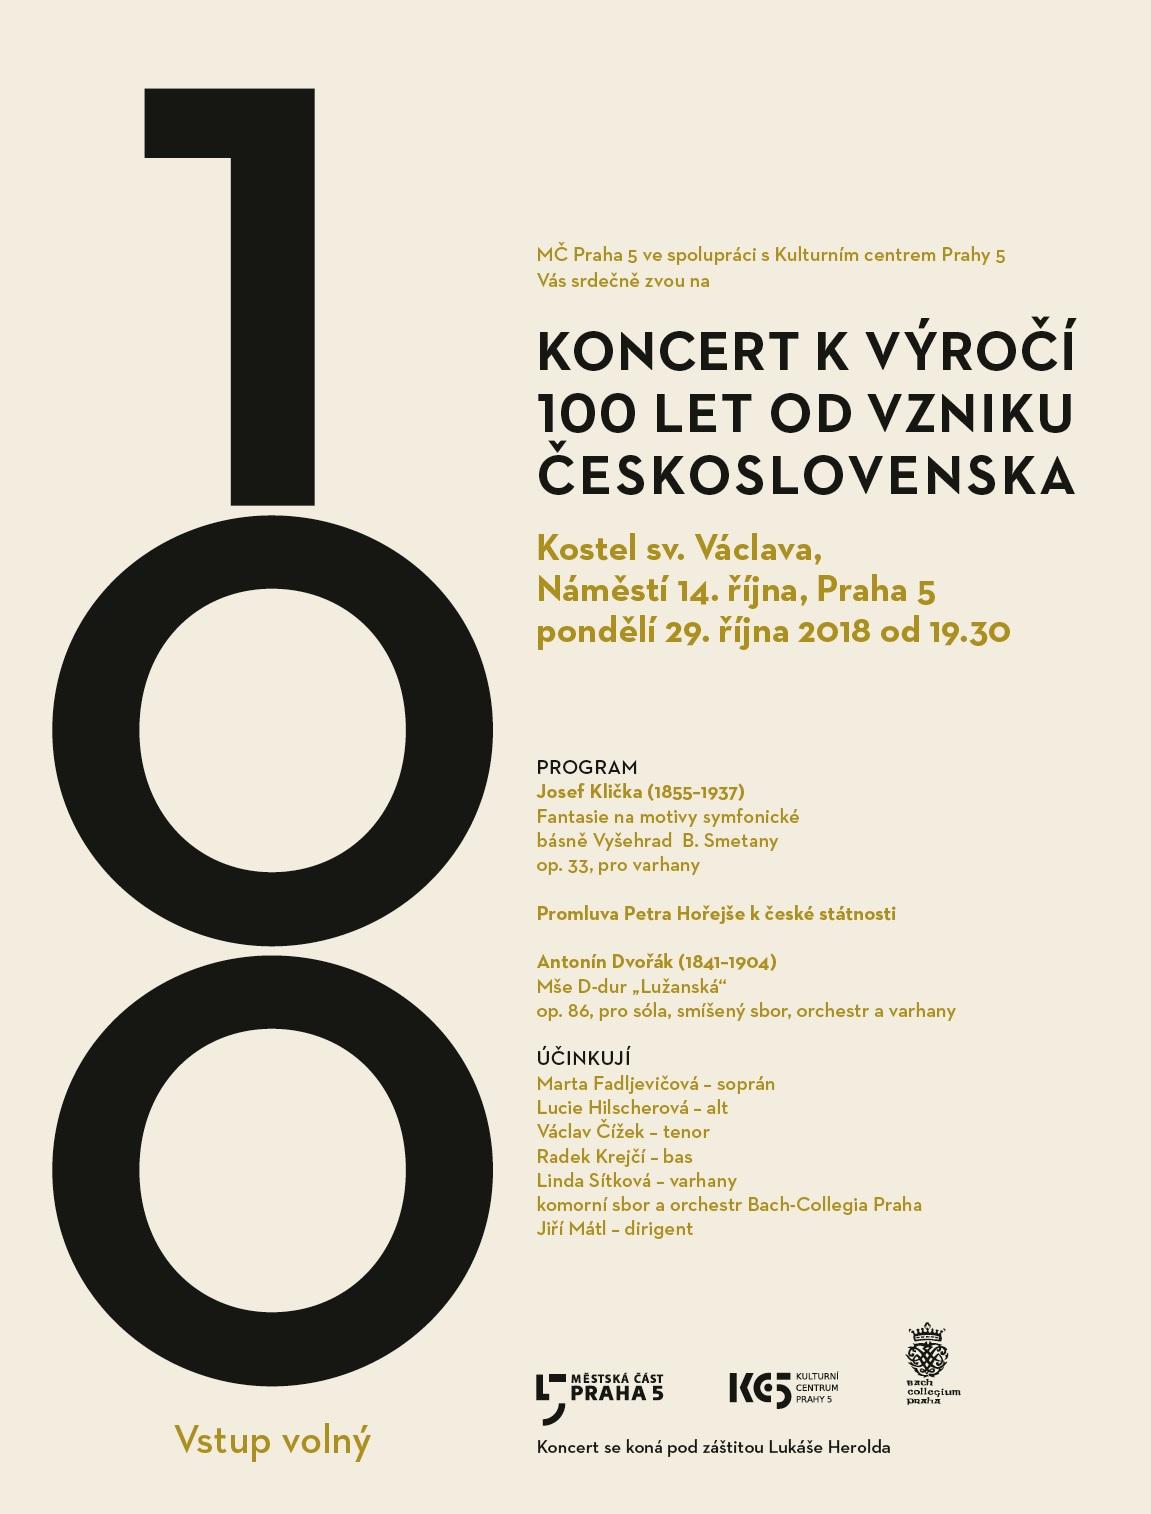 koncert-k-vyroci-100-let-od-vzniku-ceskoslovenska